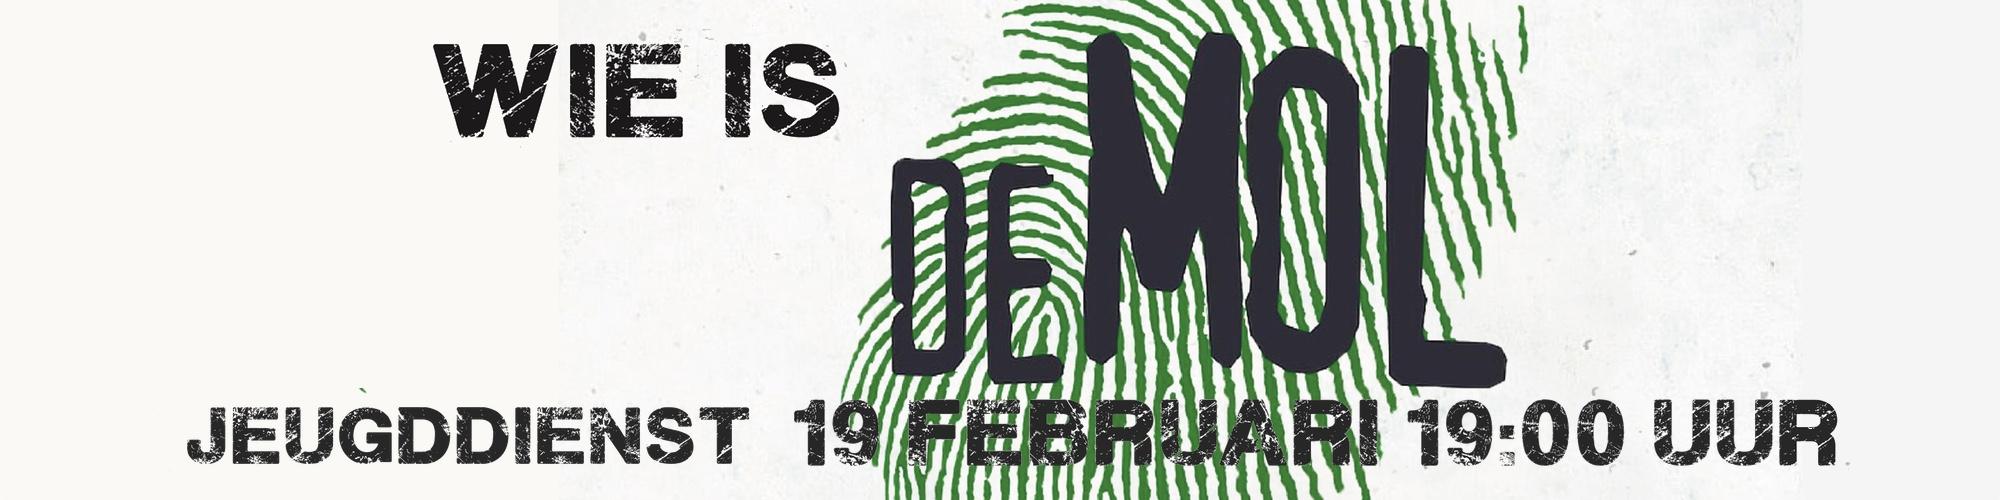 DeMol banner